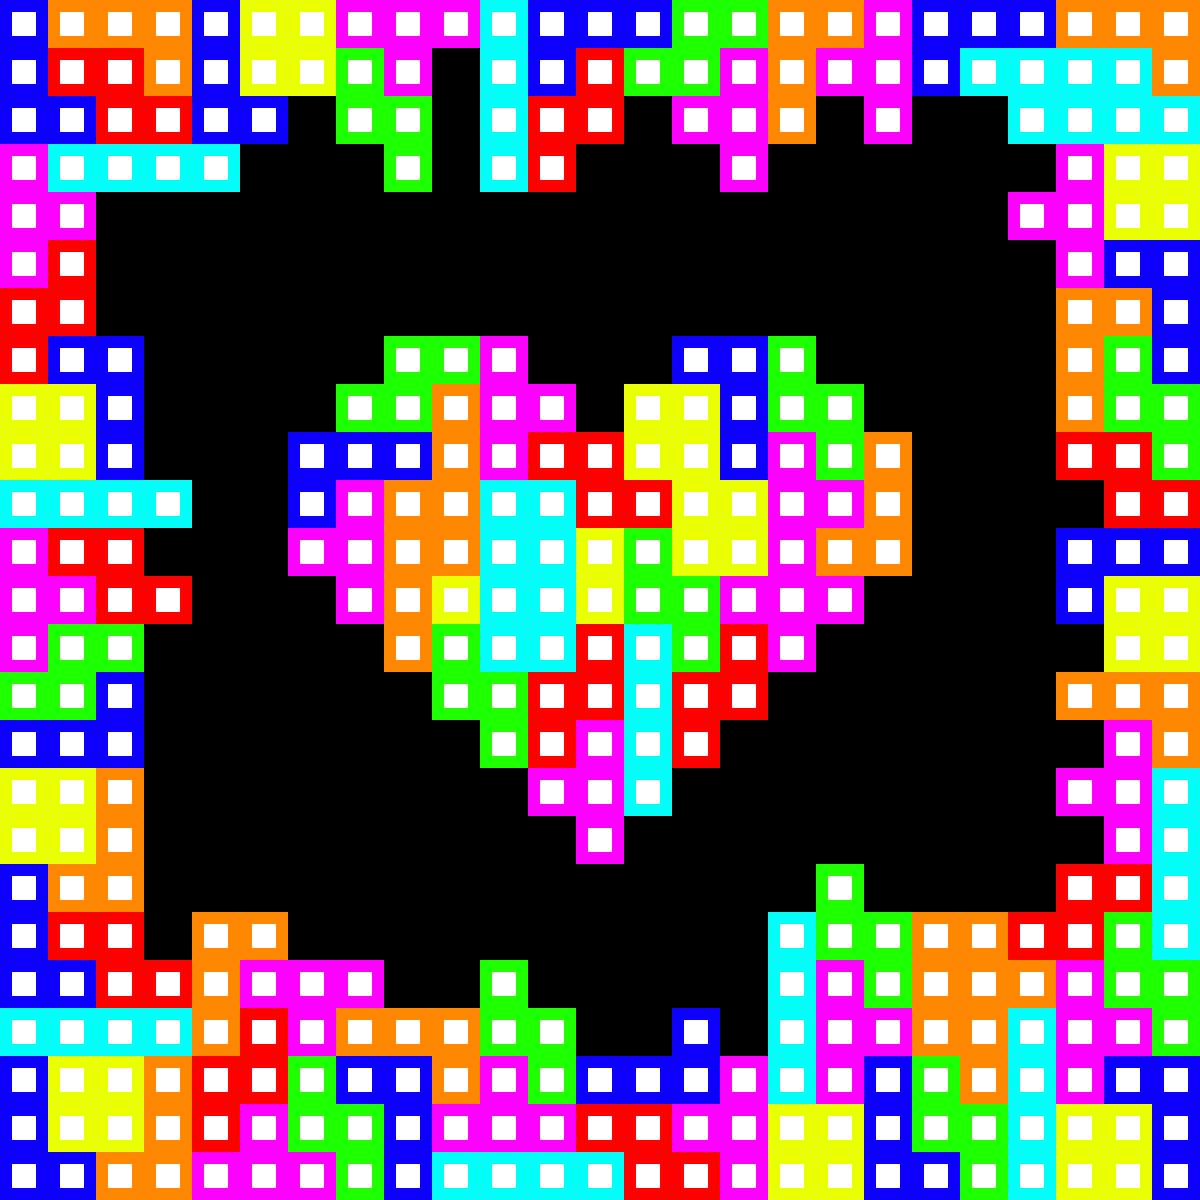 The Heart of Tetris by BullzEye731